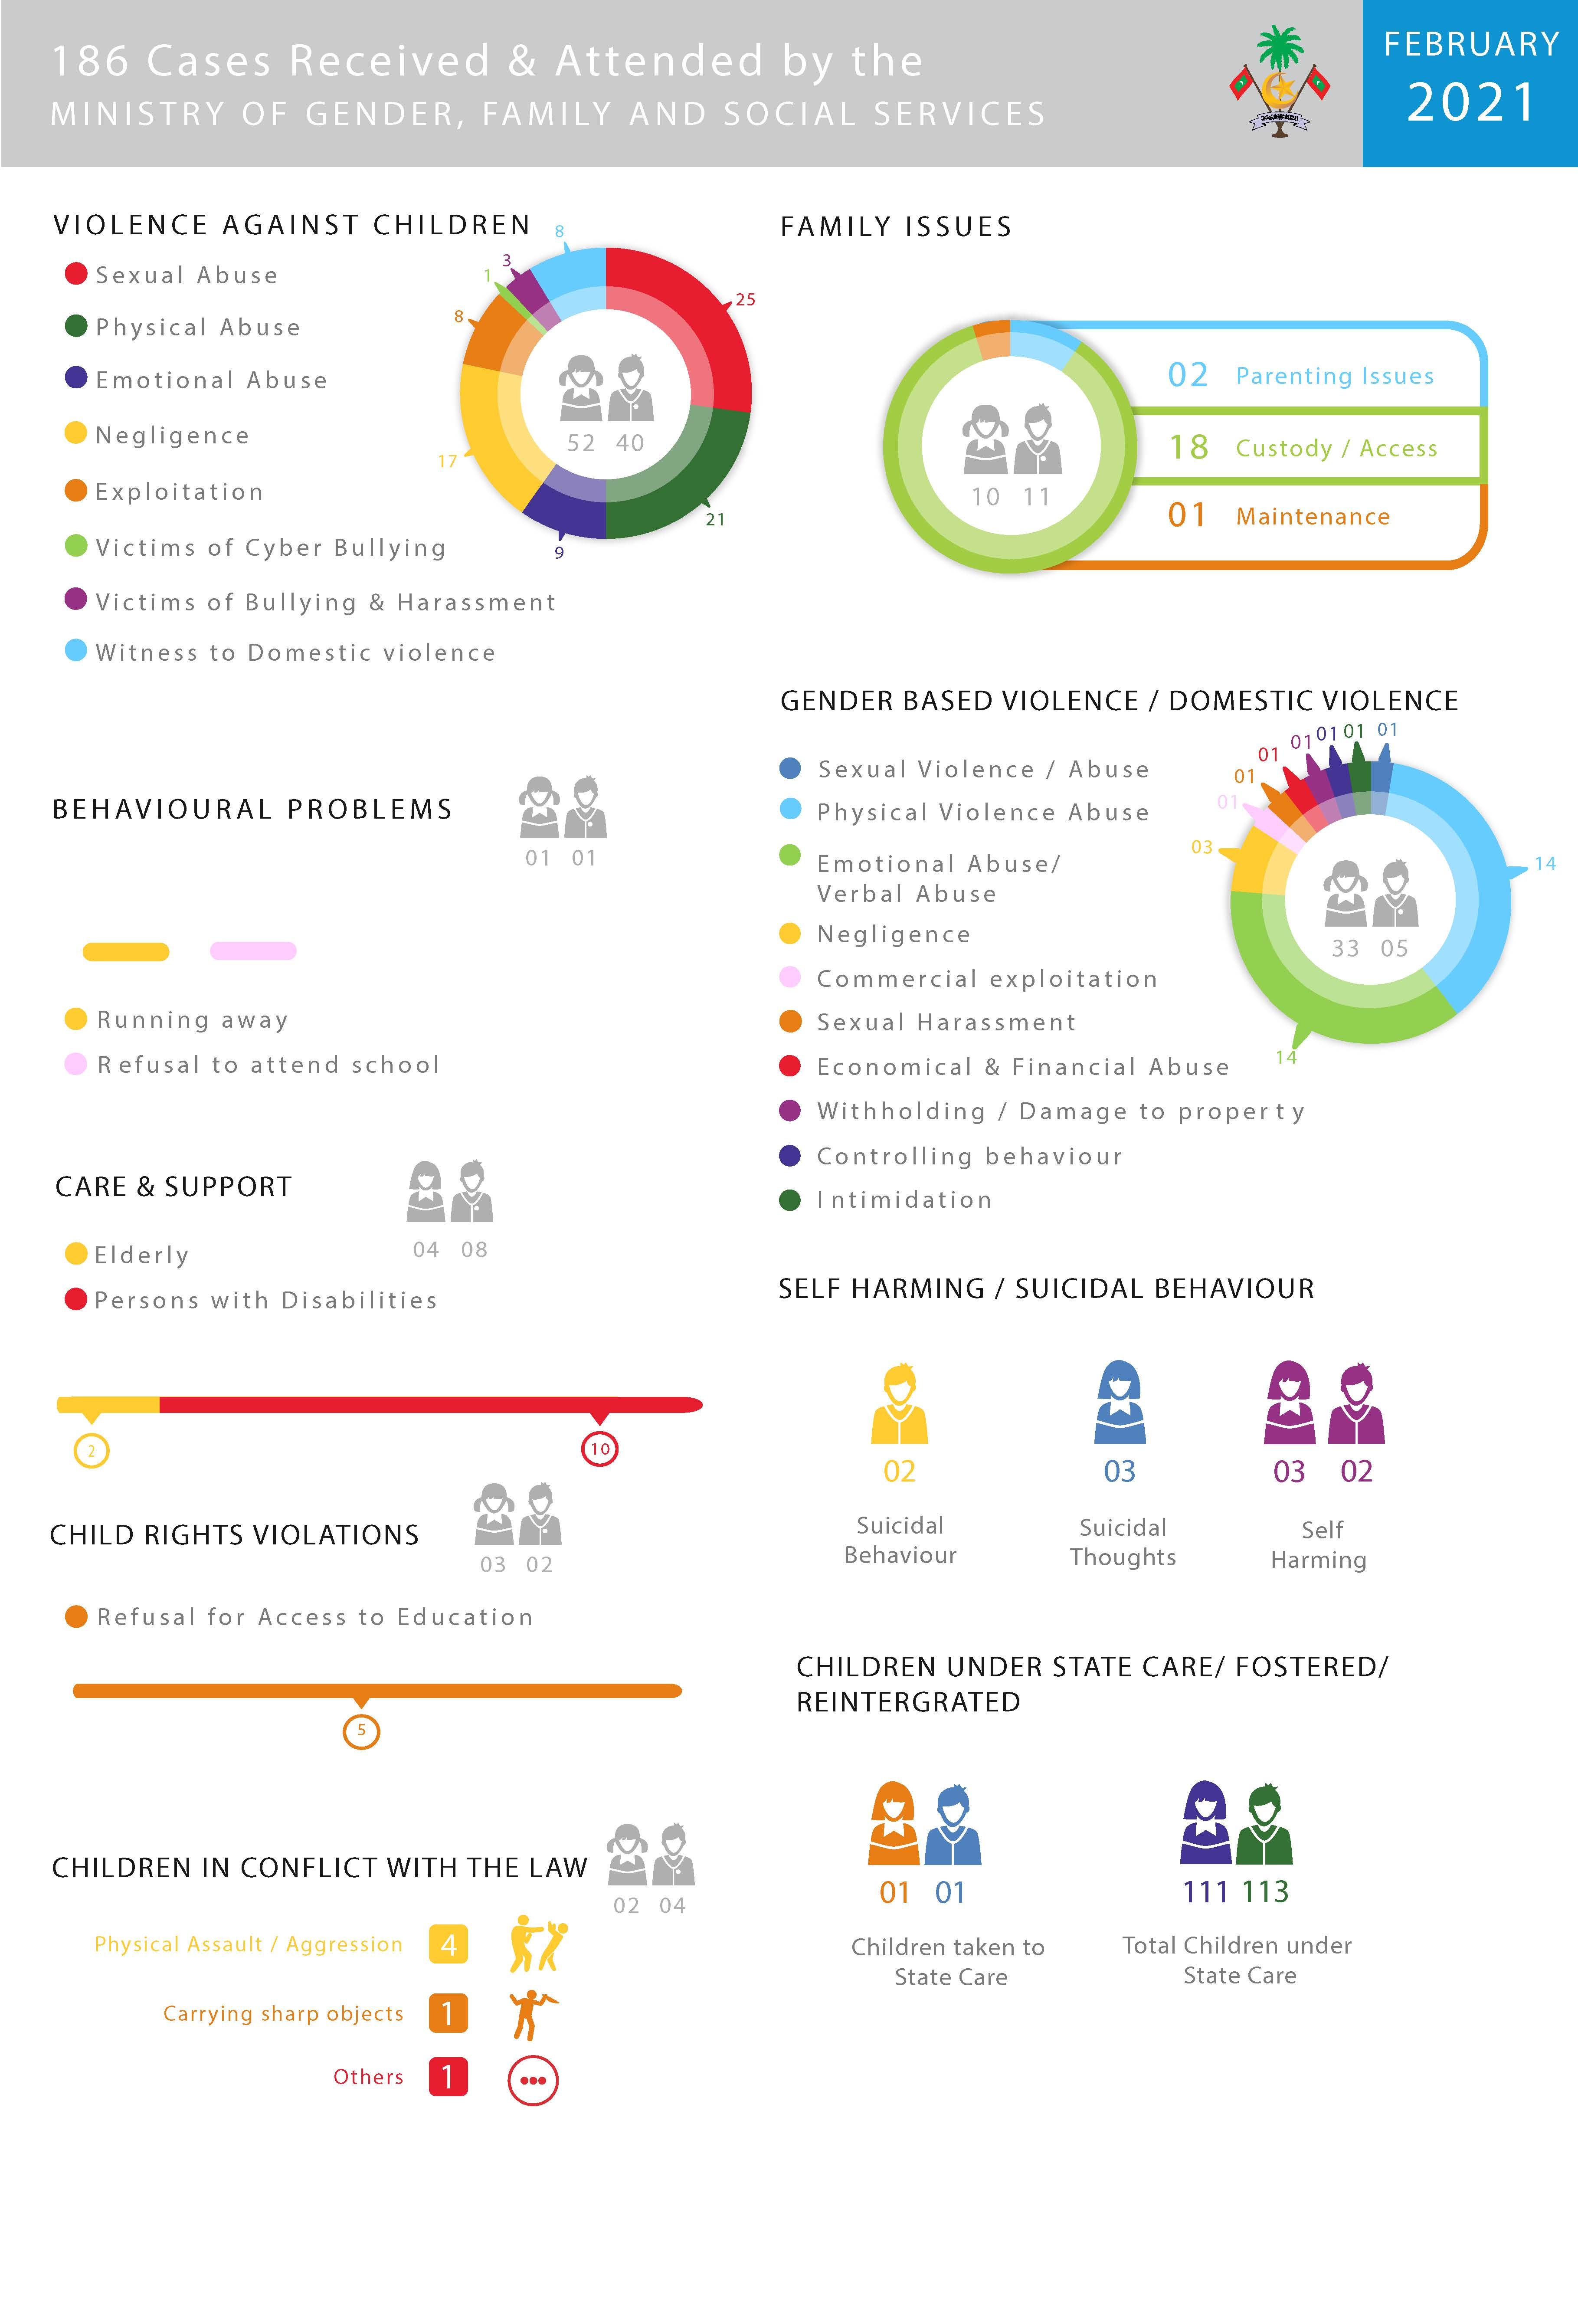 February 2021 Infographics